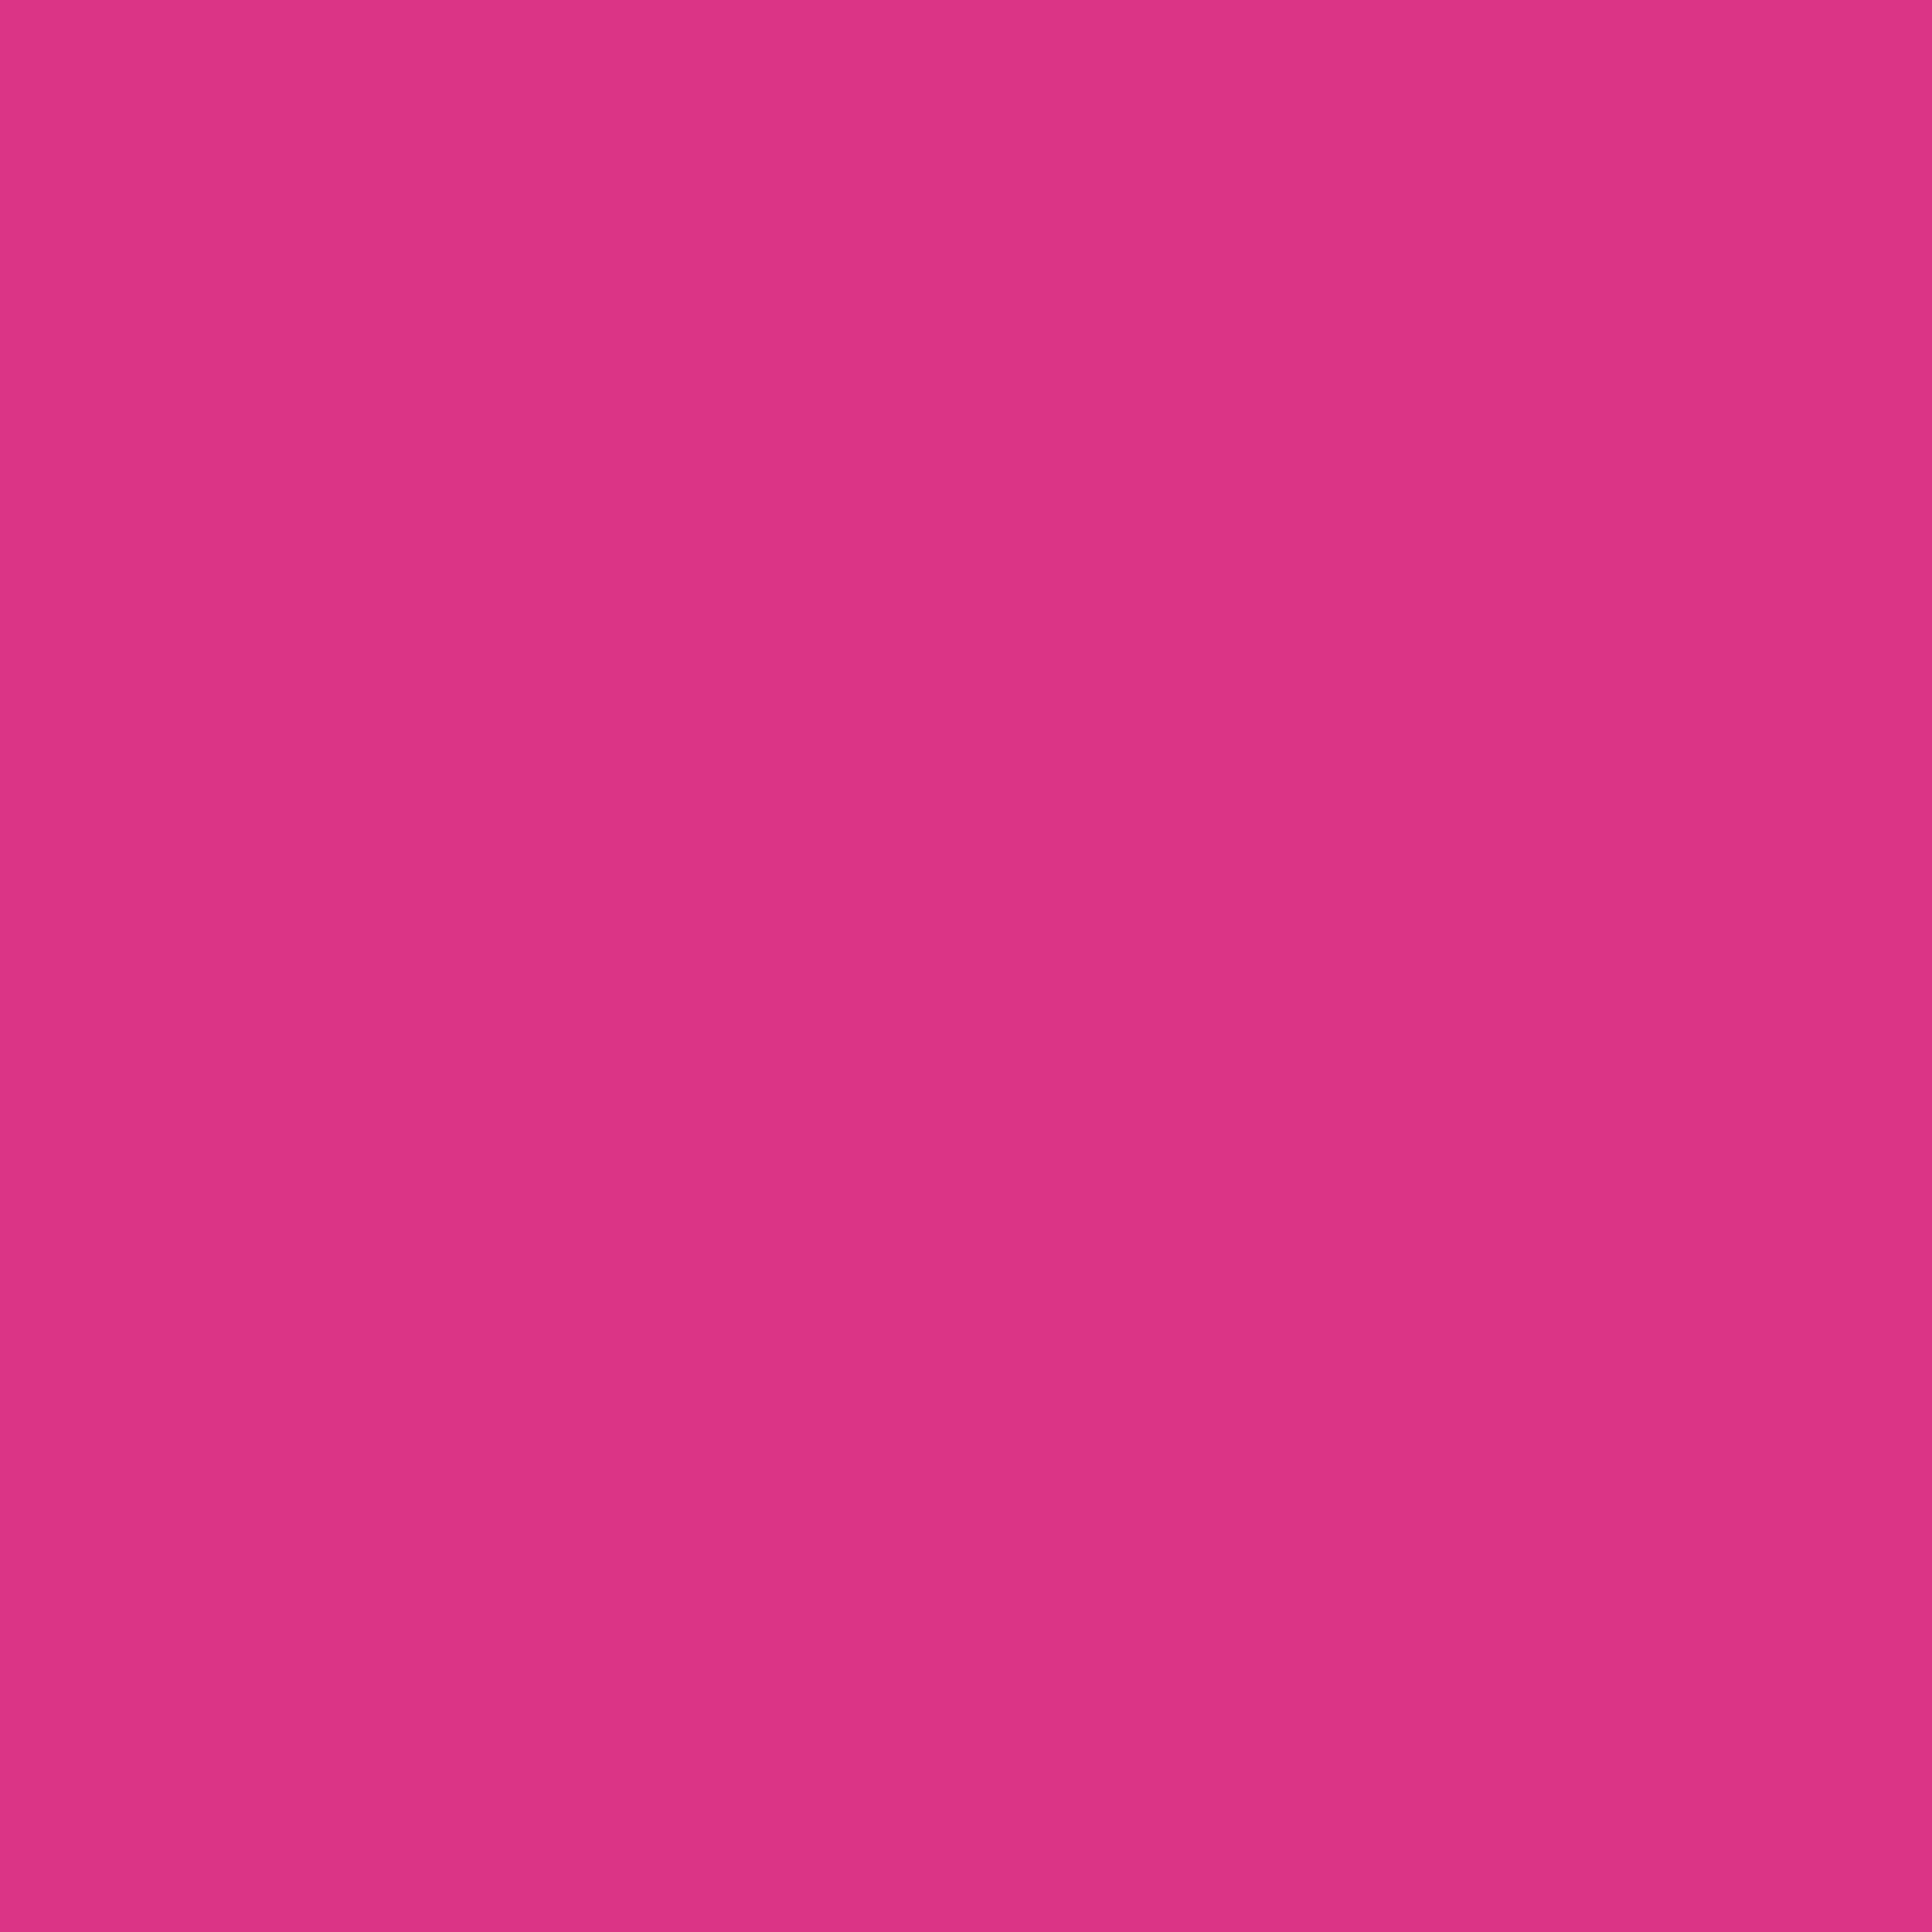 2732x2732 Deep Cerise Solid Color Background